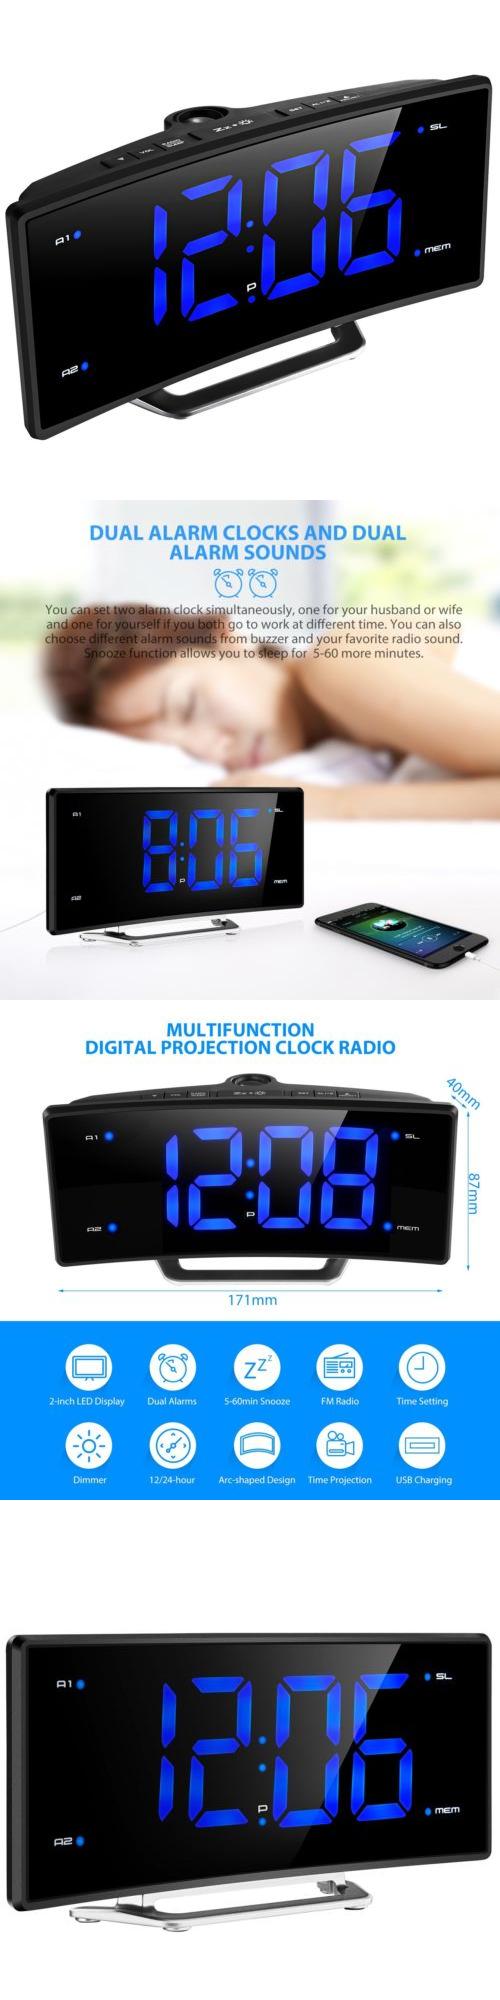 alarm clocks digital stylish curved jumbo led dual twin alarm clock projector fm radio